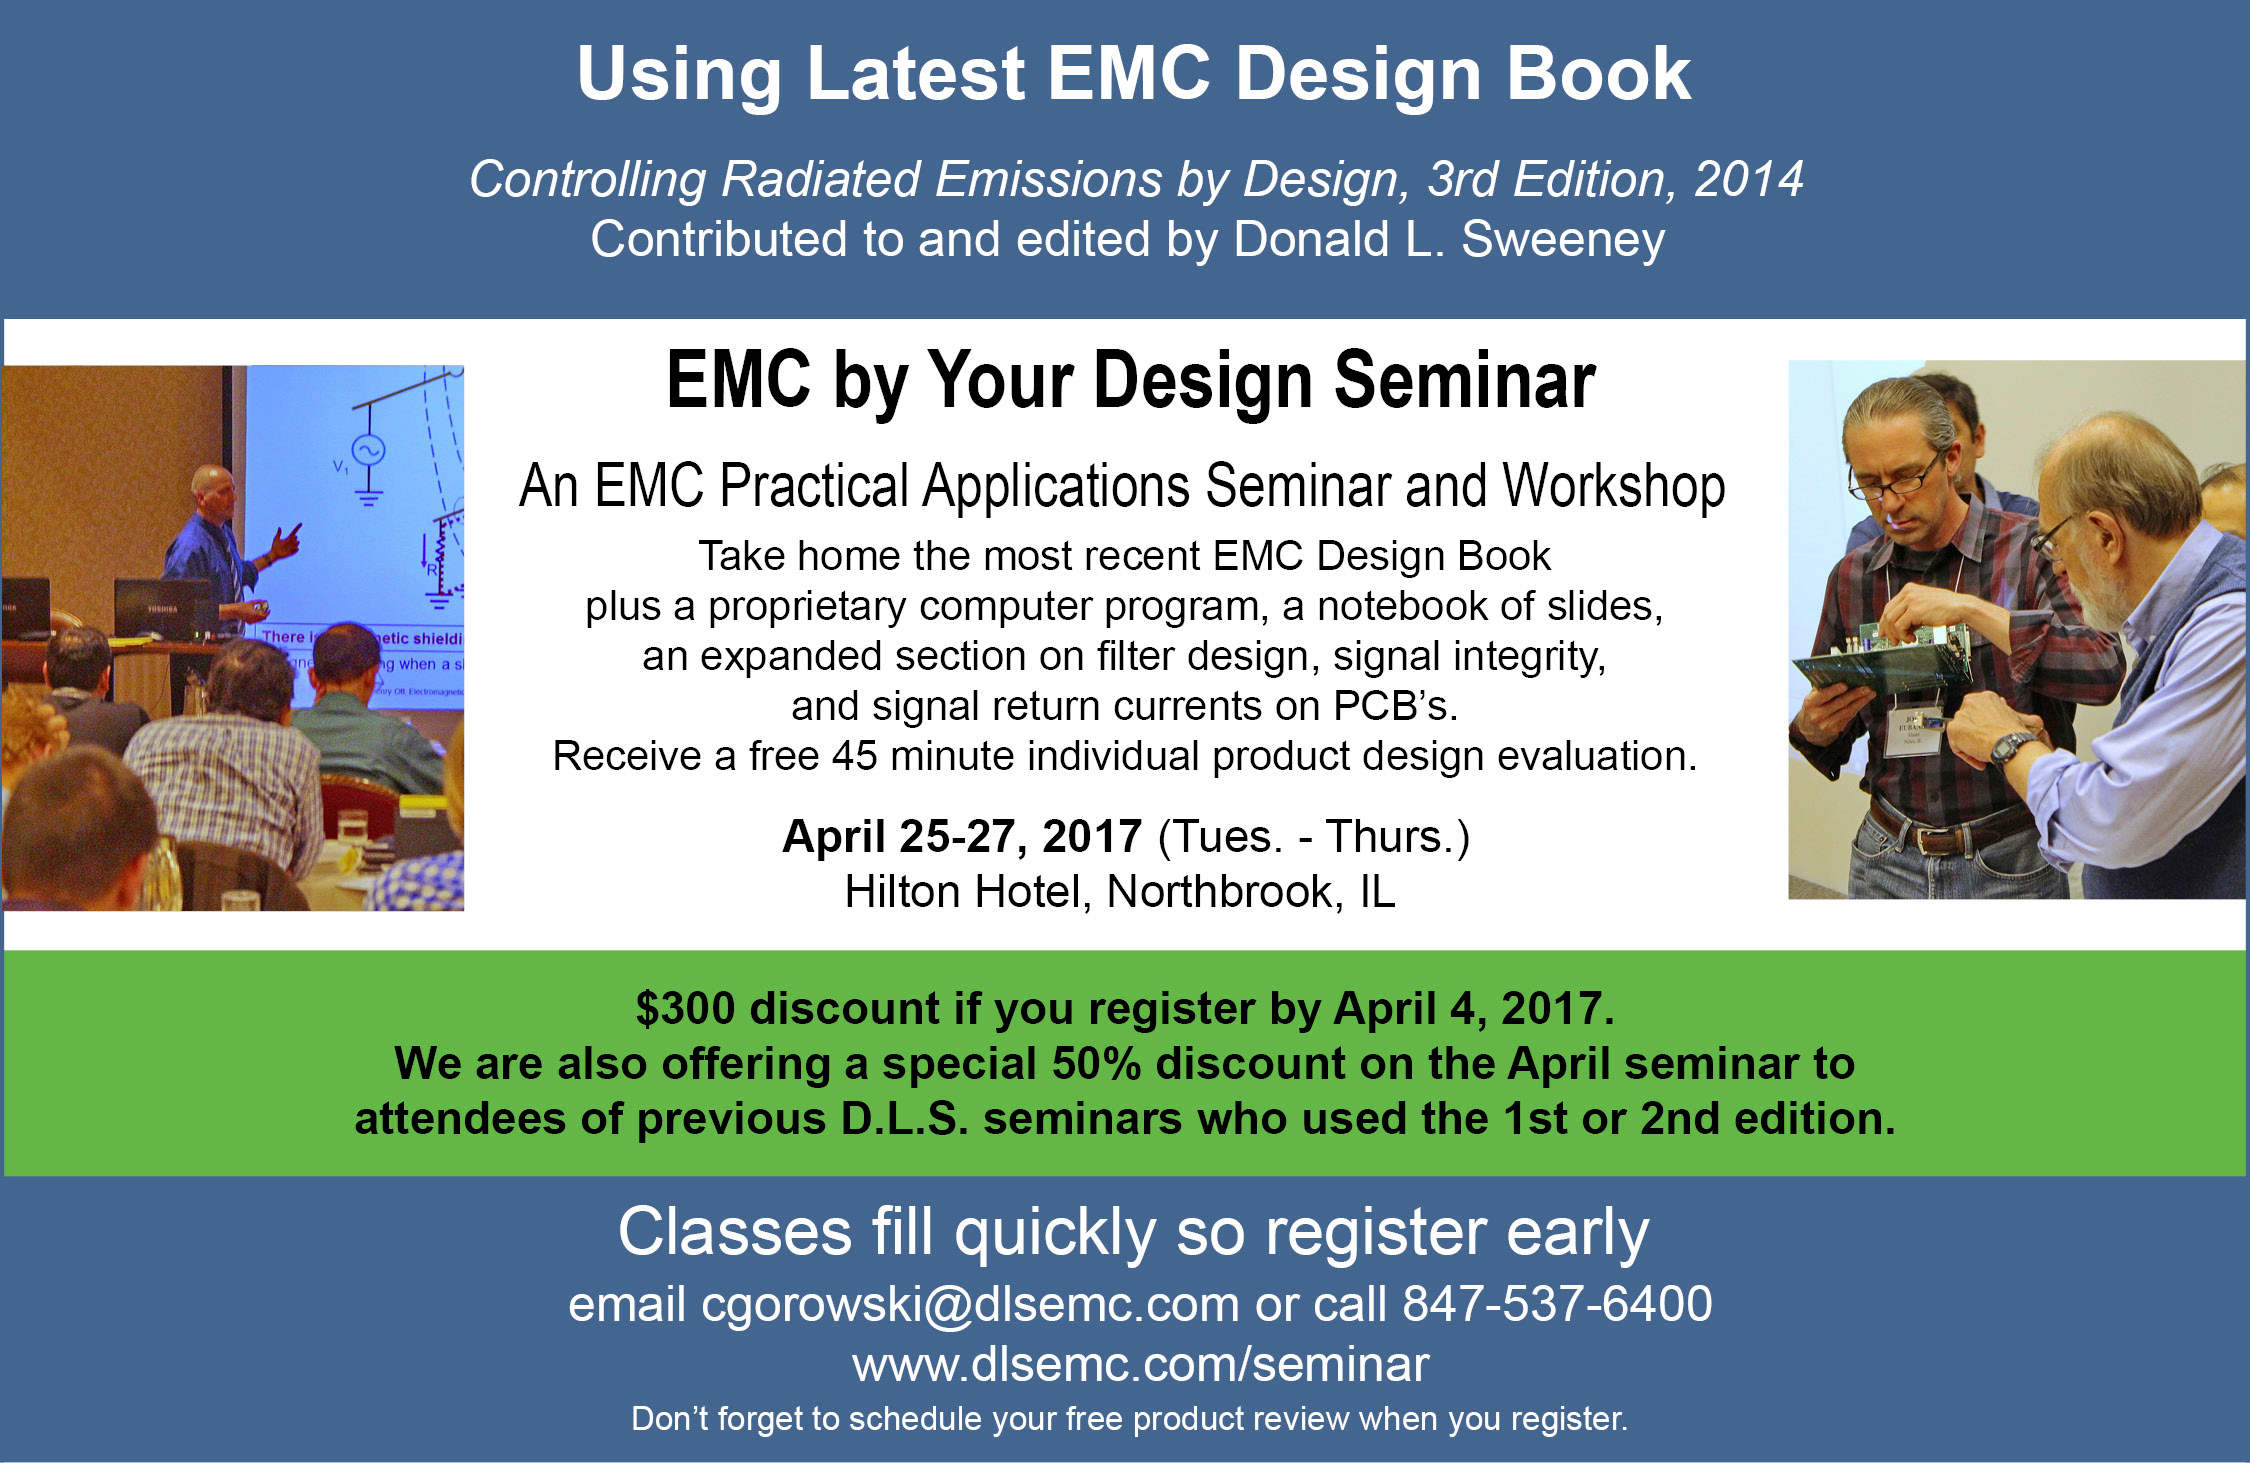 EMC Testing Experts